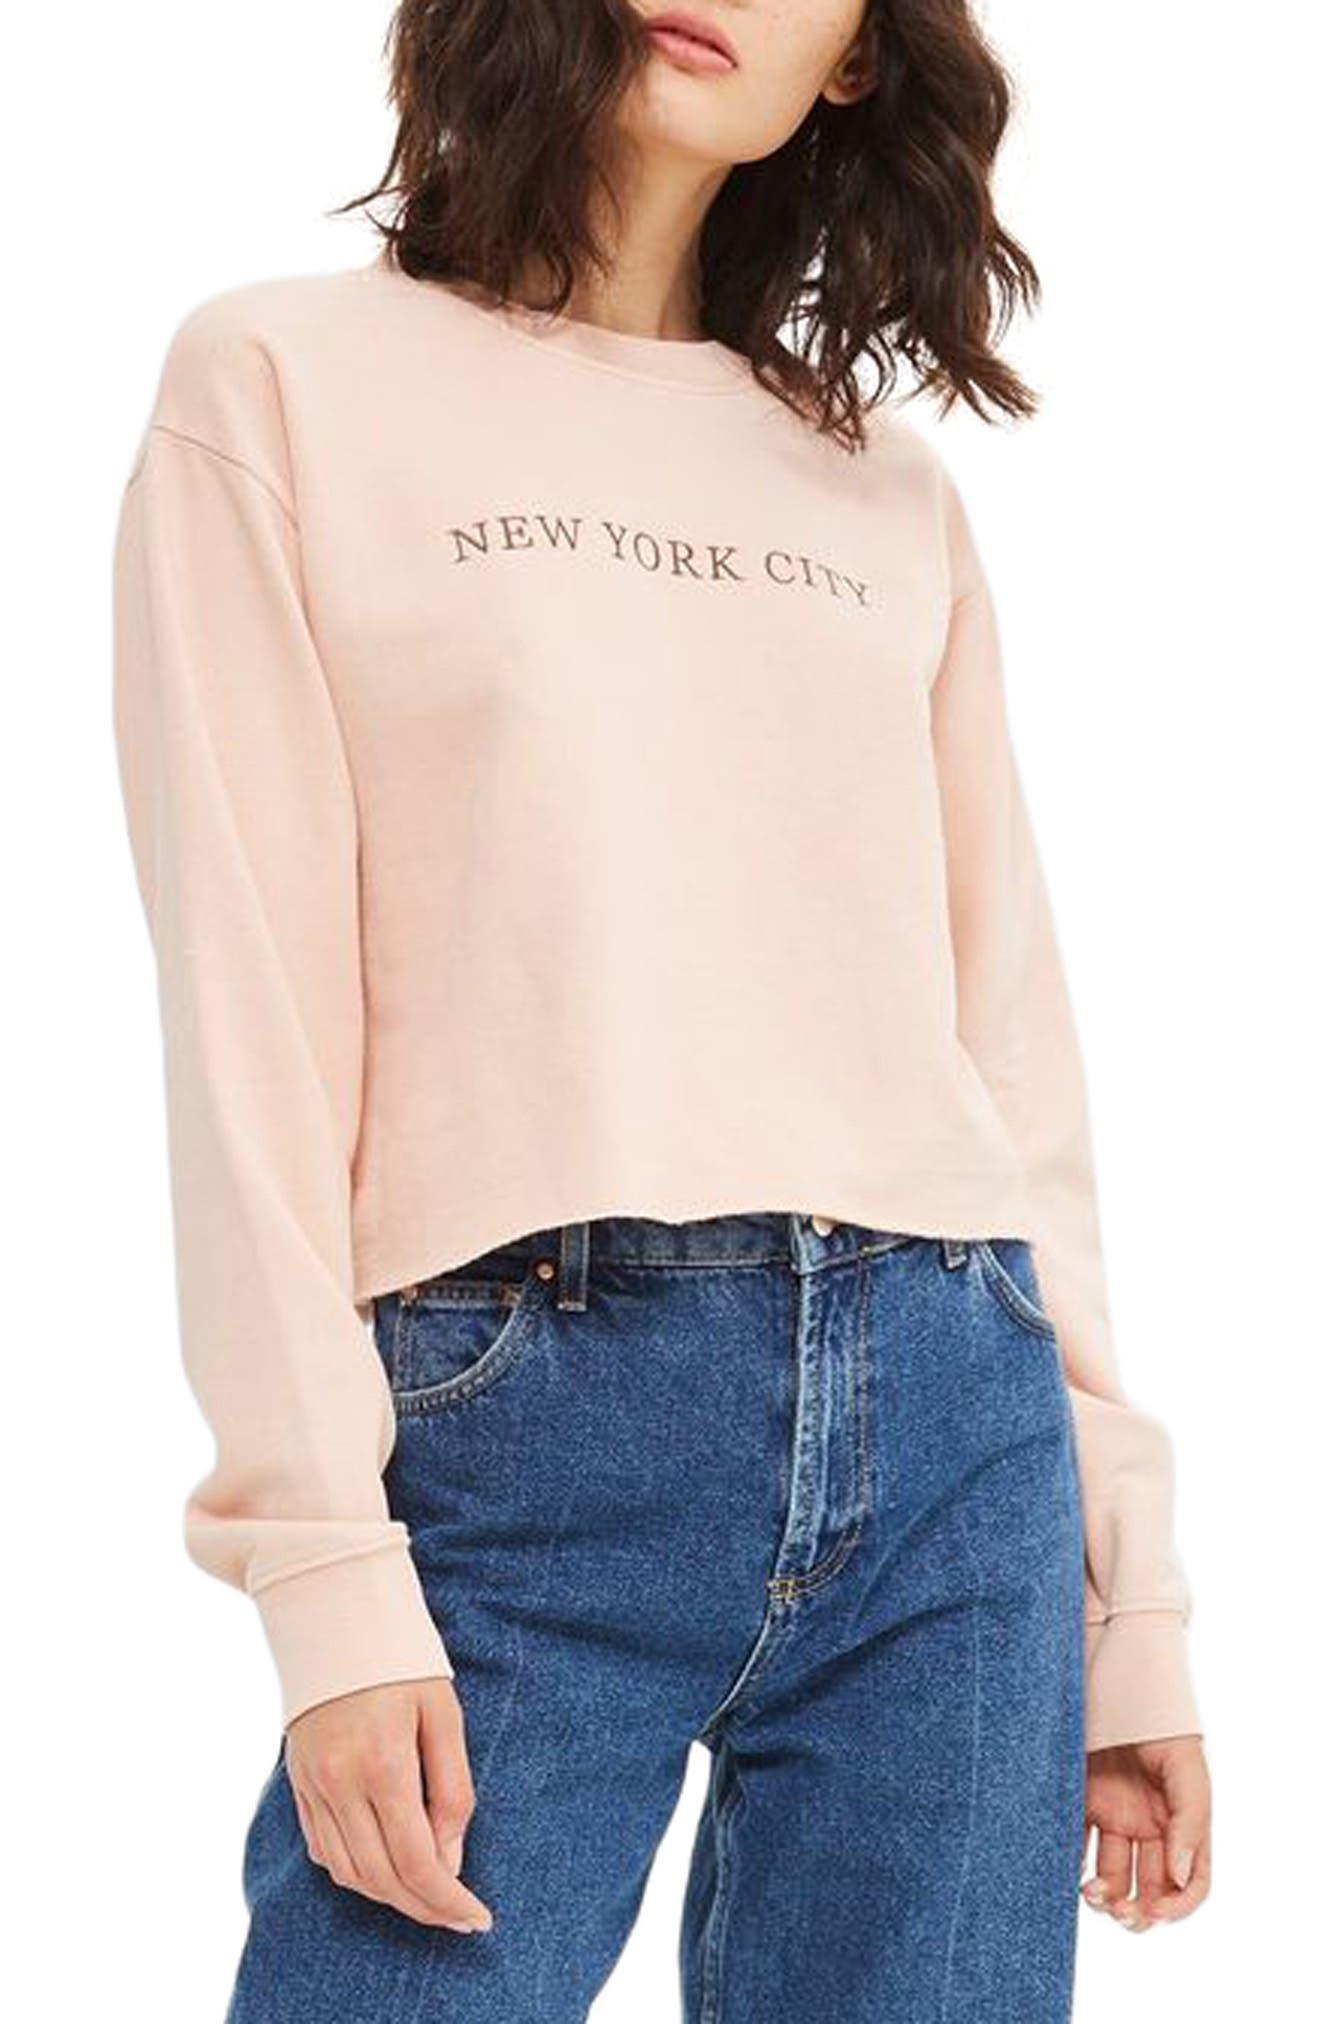 Main Image - Topshop New York City Embroidered Sweatshirt